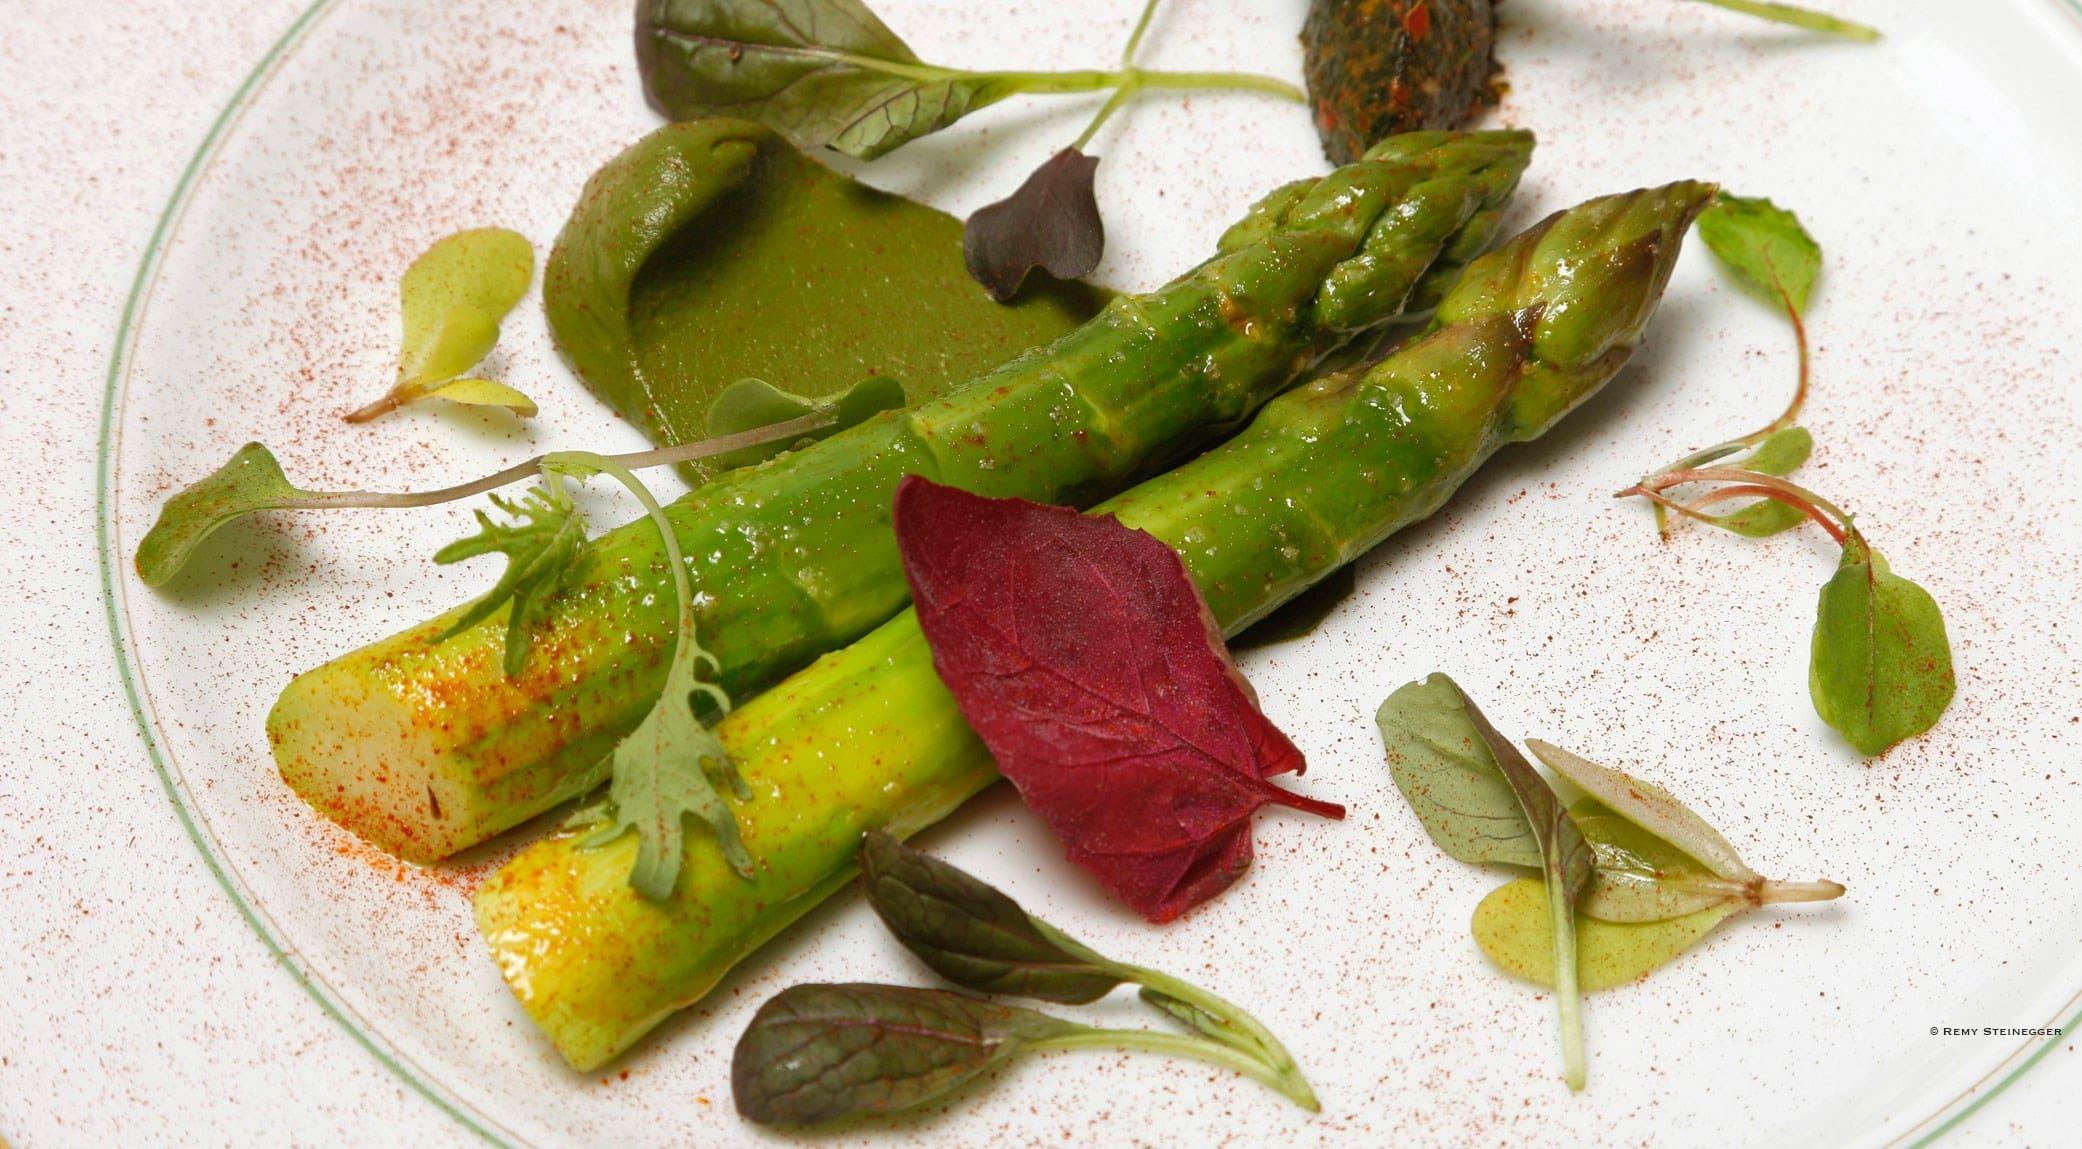 original_08-SPellegrino-Sapori-Ticino-Dish-Pascal-Barbot.jpg